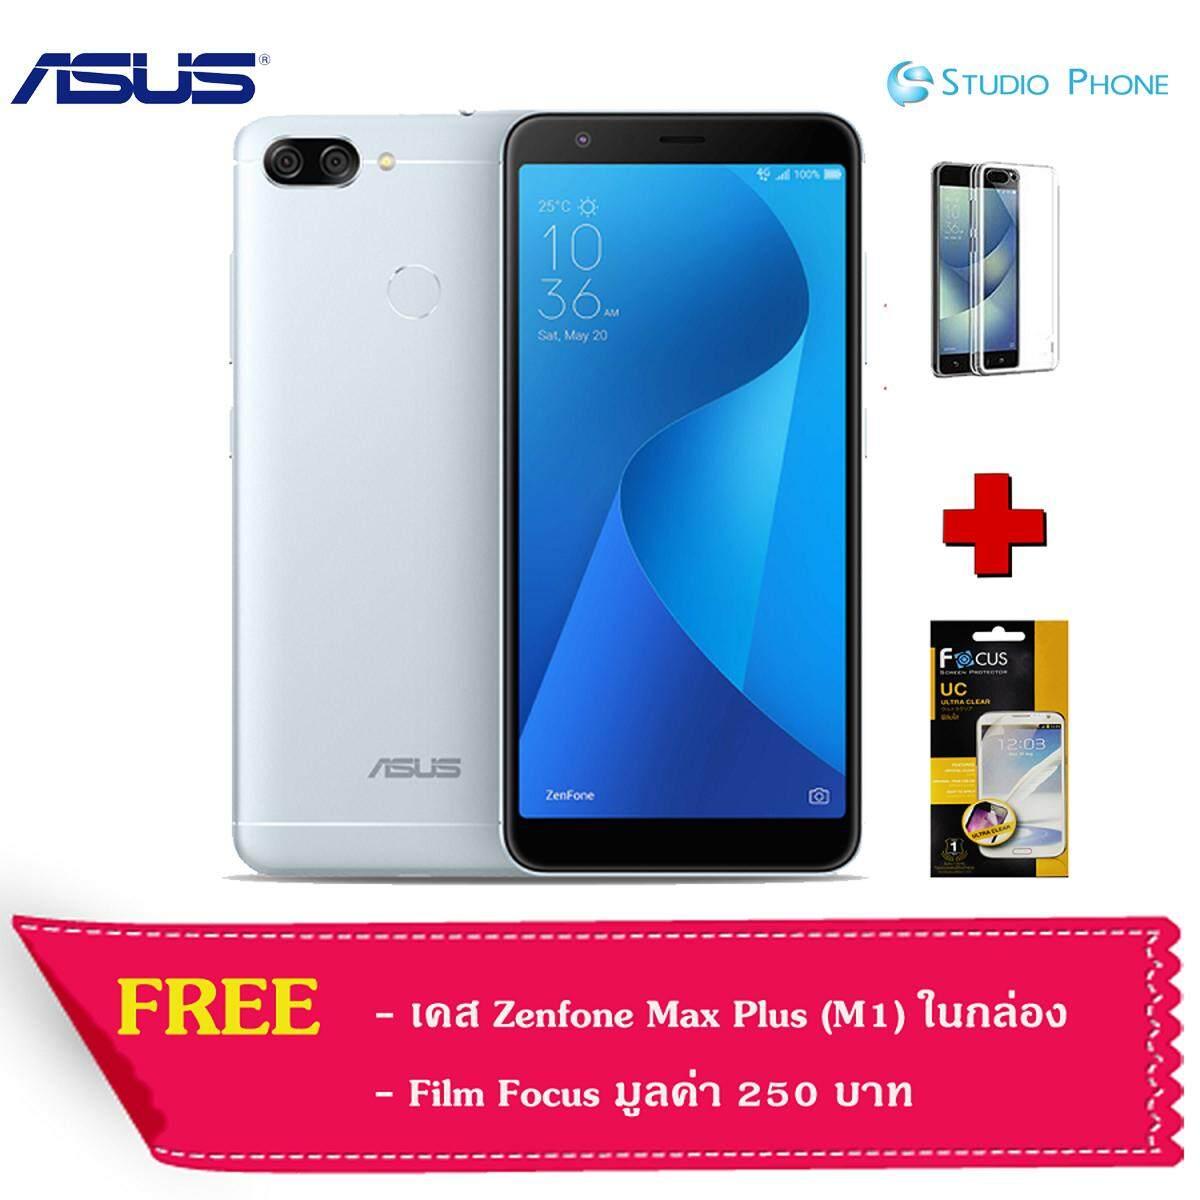 ASUS Zenfone Max Plus (M1) - Silver blue (FREE CASE ในกล่อง + ฟิล์มกันรอย Focus มูลค่า 150 บาท)